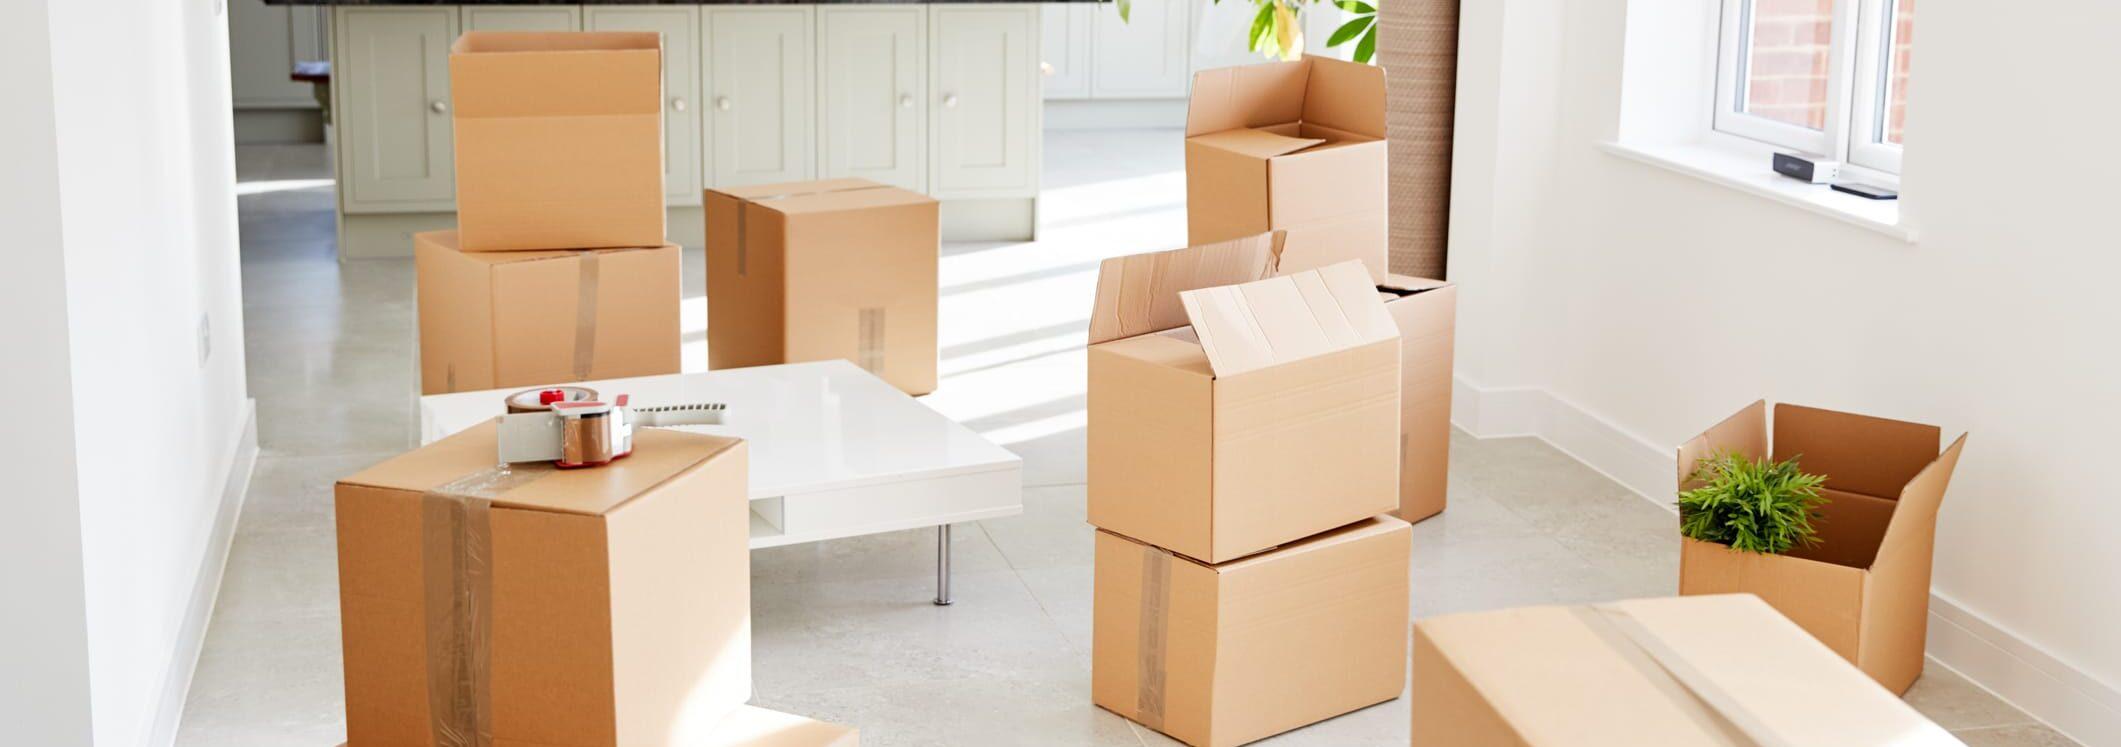 house-move-1